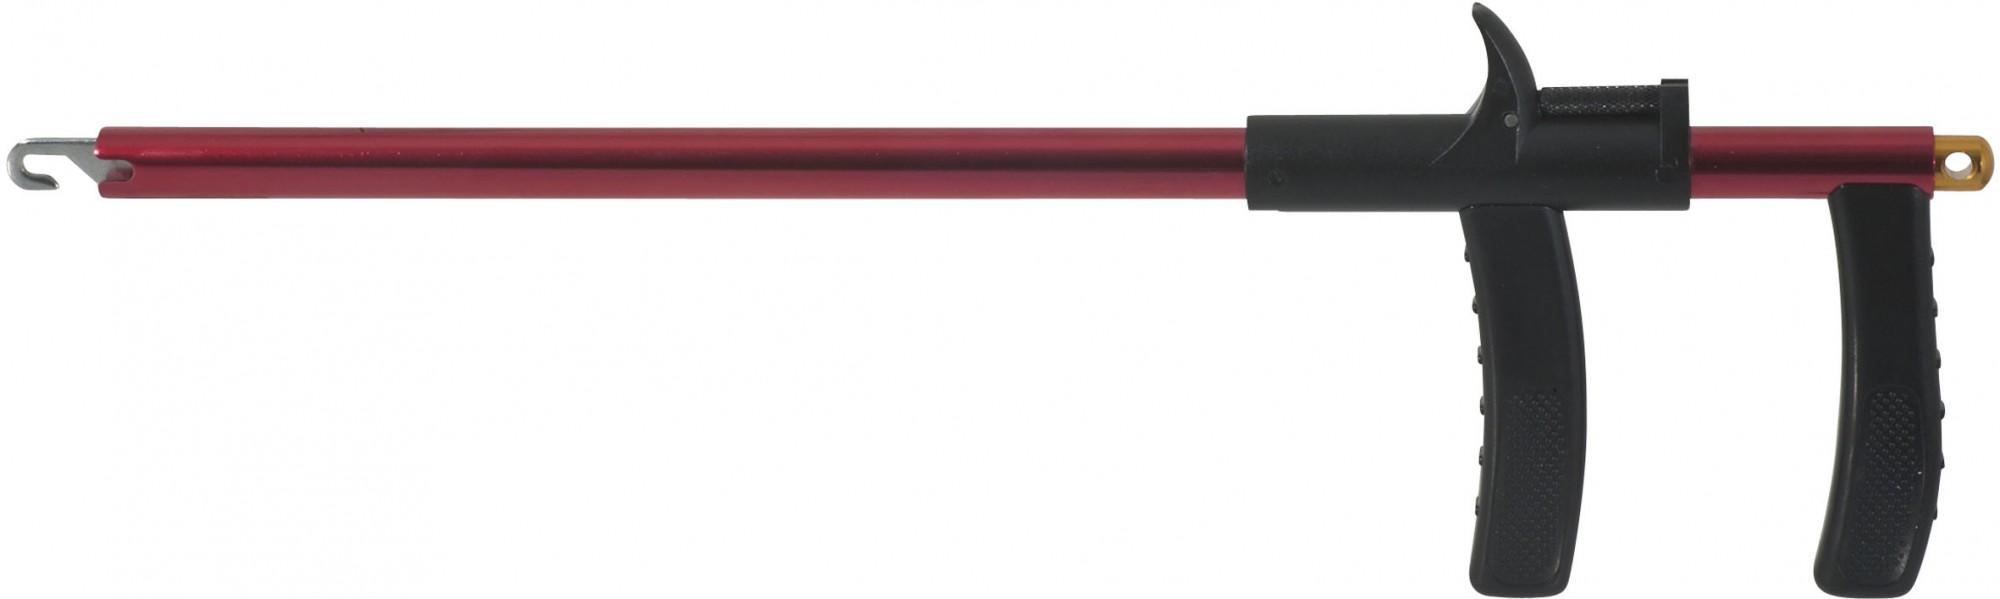 uni-cat-hook-remoover-xxl-34cm-hakenla-ser